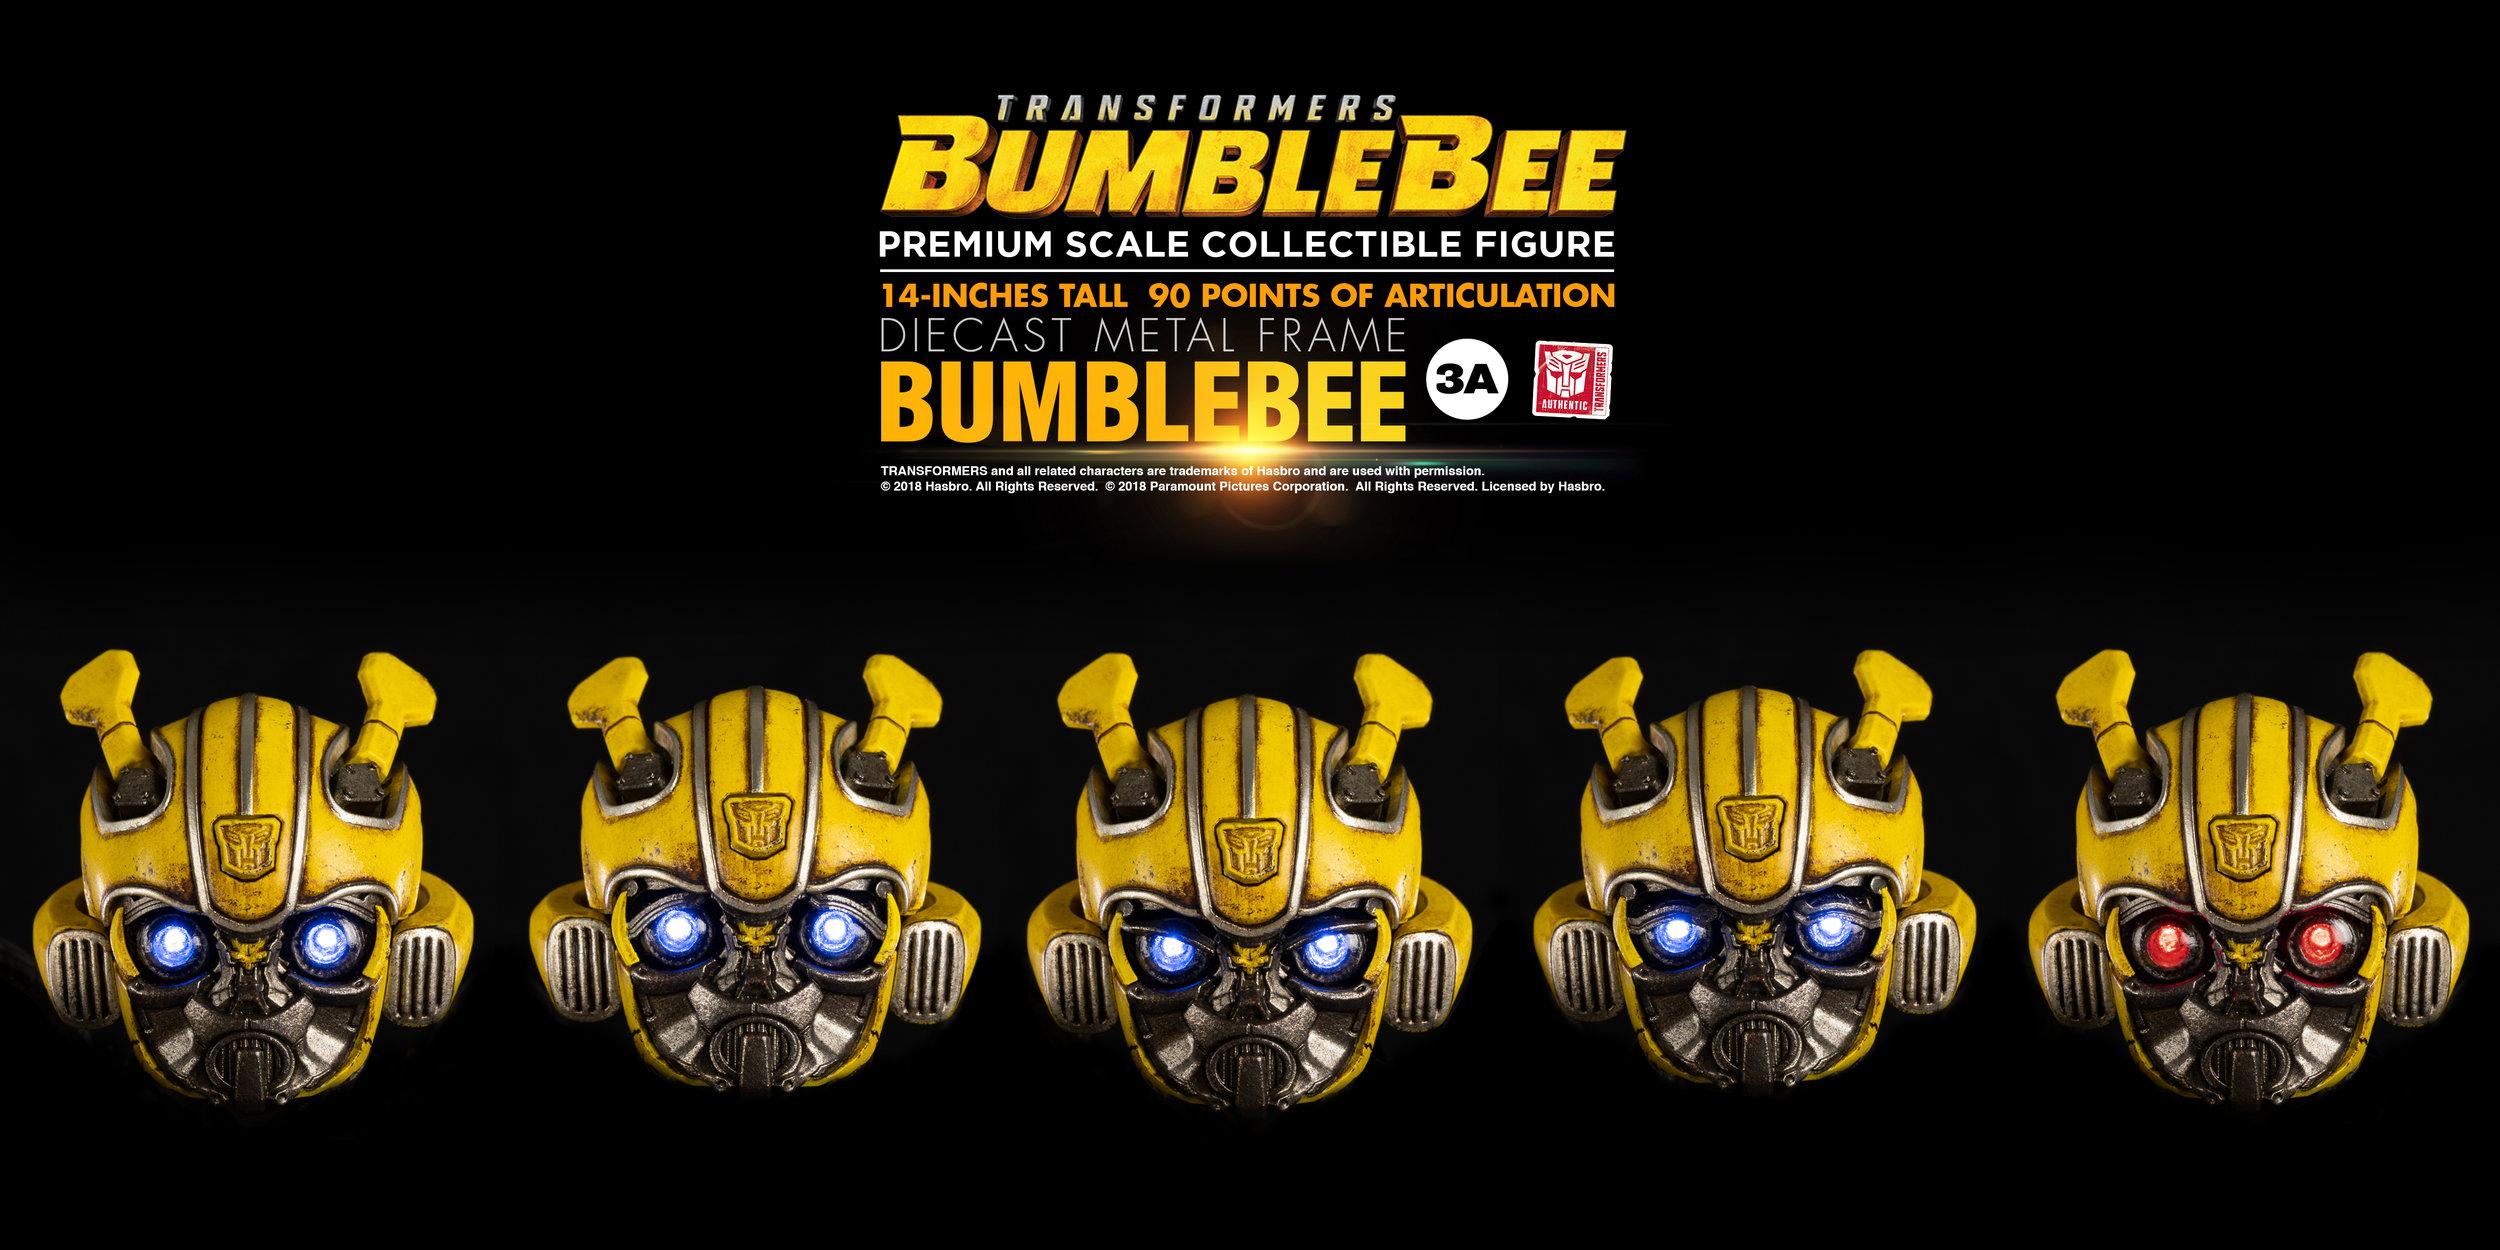 Bumblebee_ENG_PM_eyes-shape.jpg